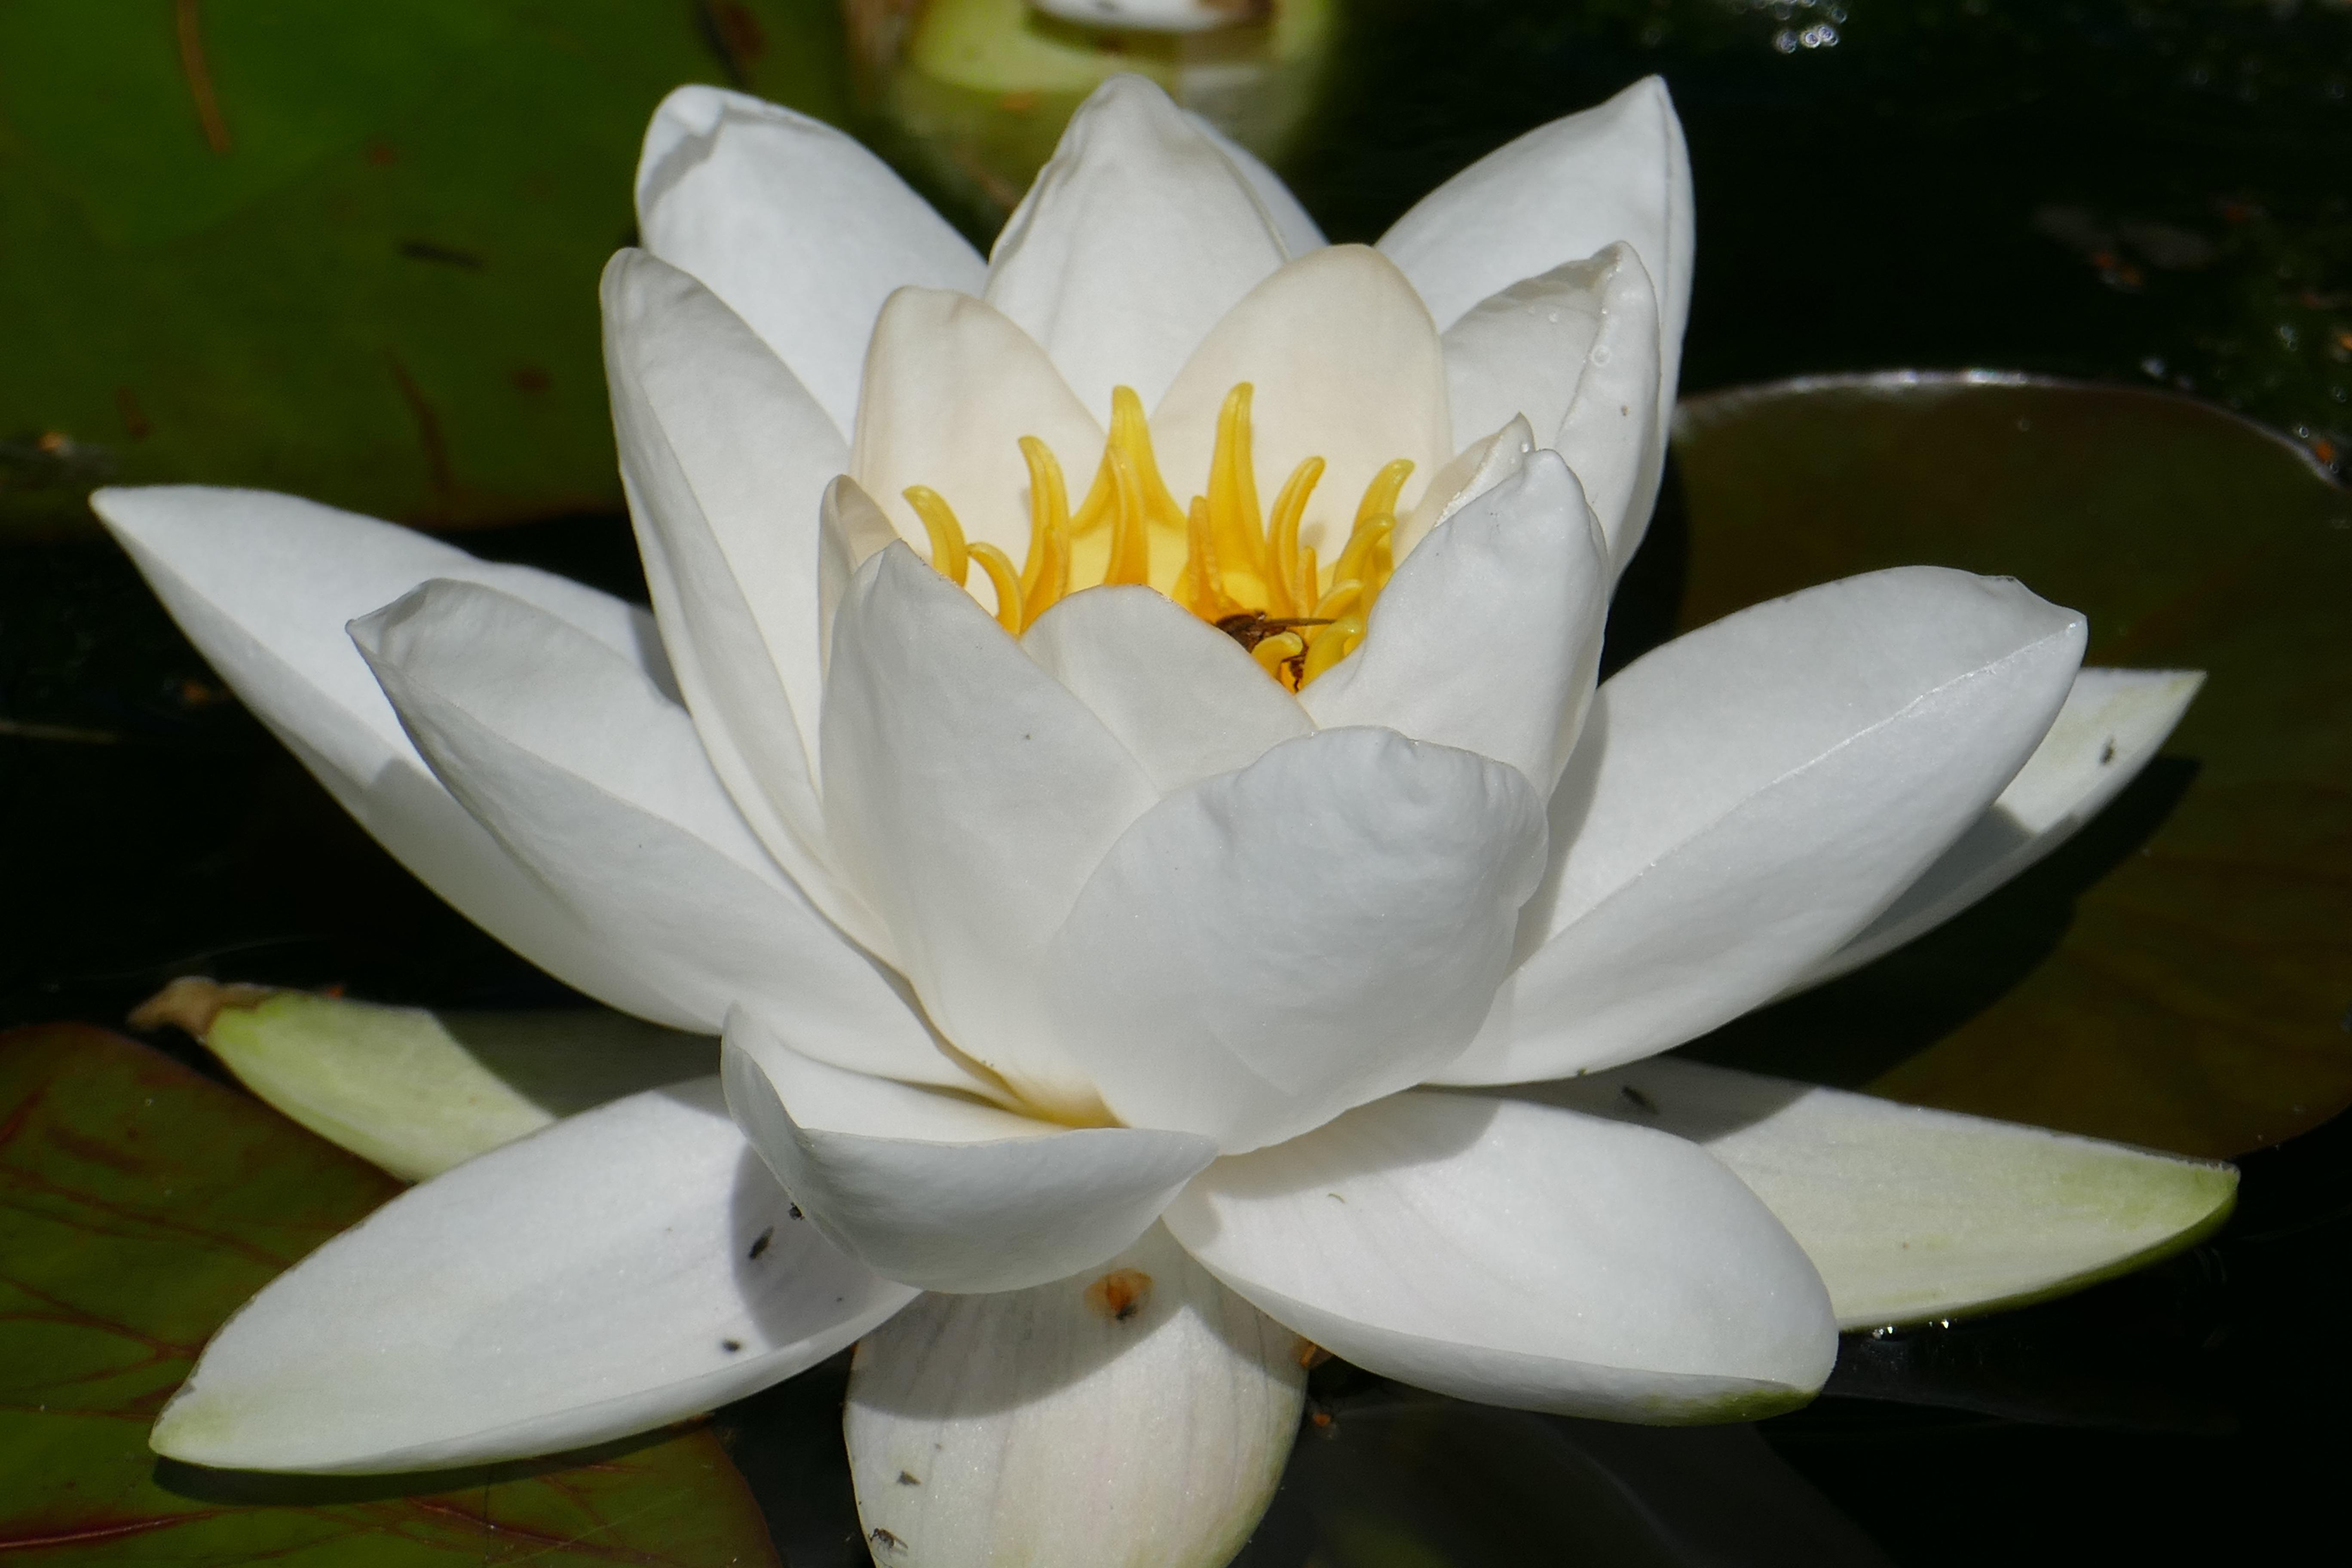 Free Images Nature Blossom White Flower Petal Bloom Botany